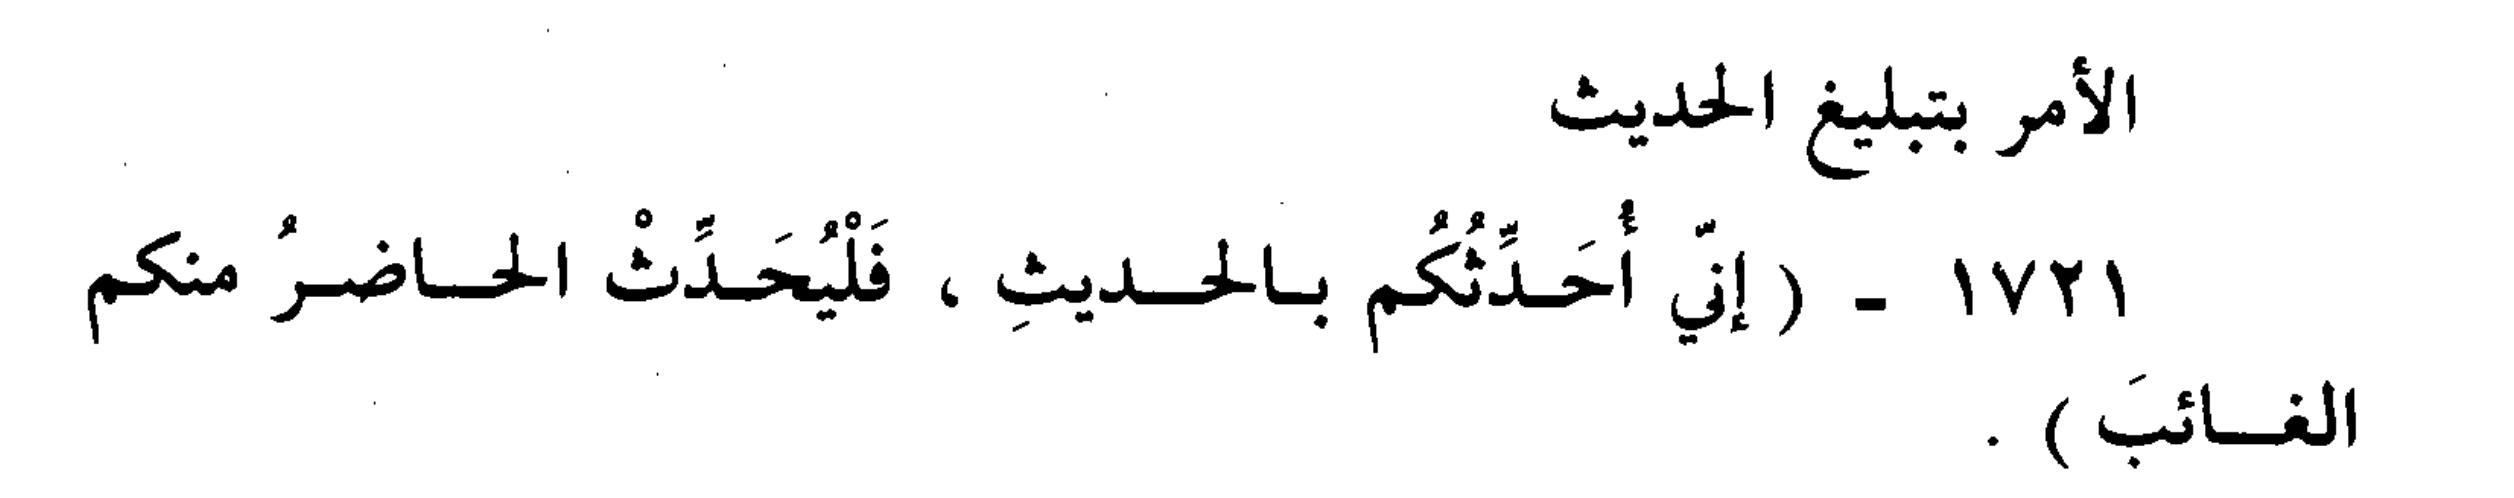 hadith.png